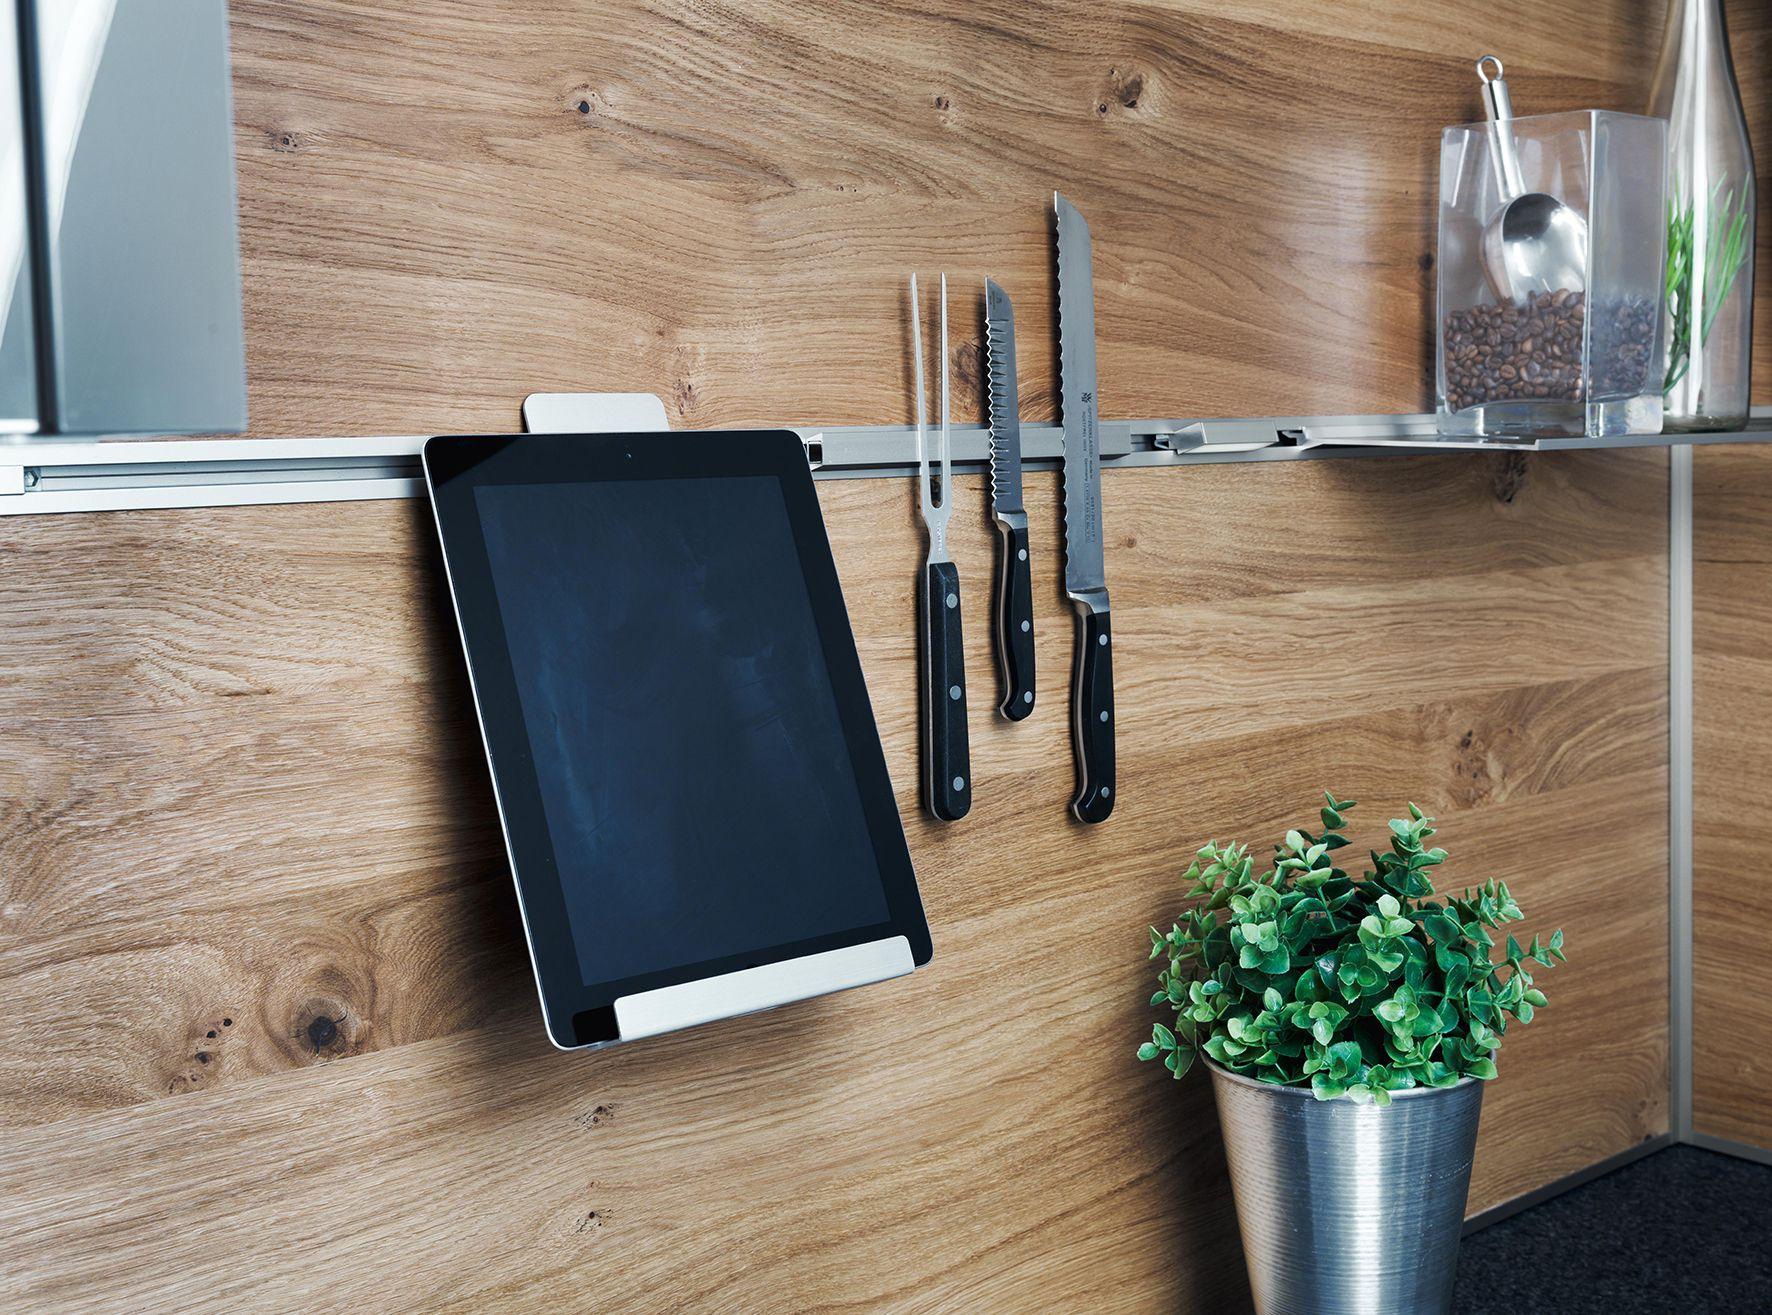 funktionsr ckwand system mit tablethalter und magnetprofil von ewe k chen alles offen alles. Black Bedroom Furniture Sets. Home Design Ideas